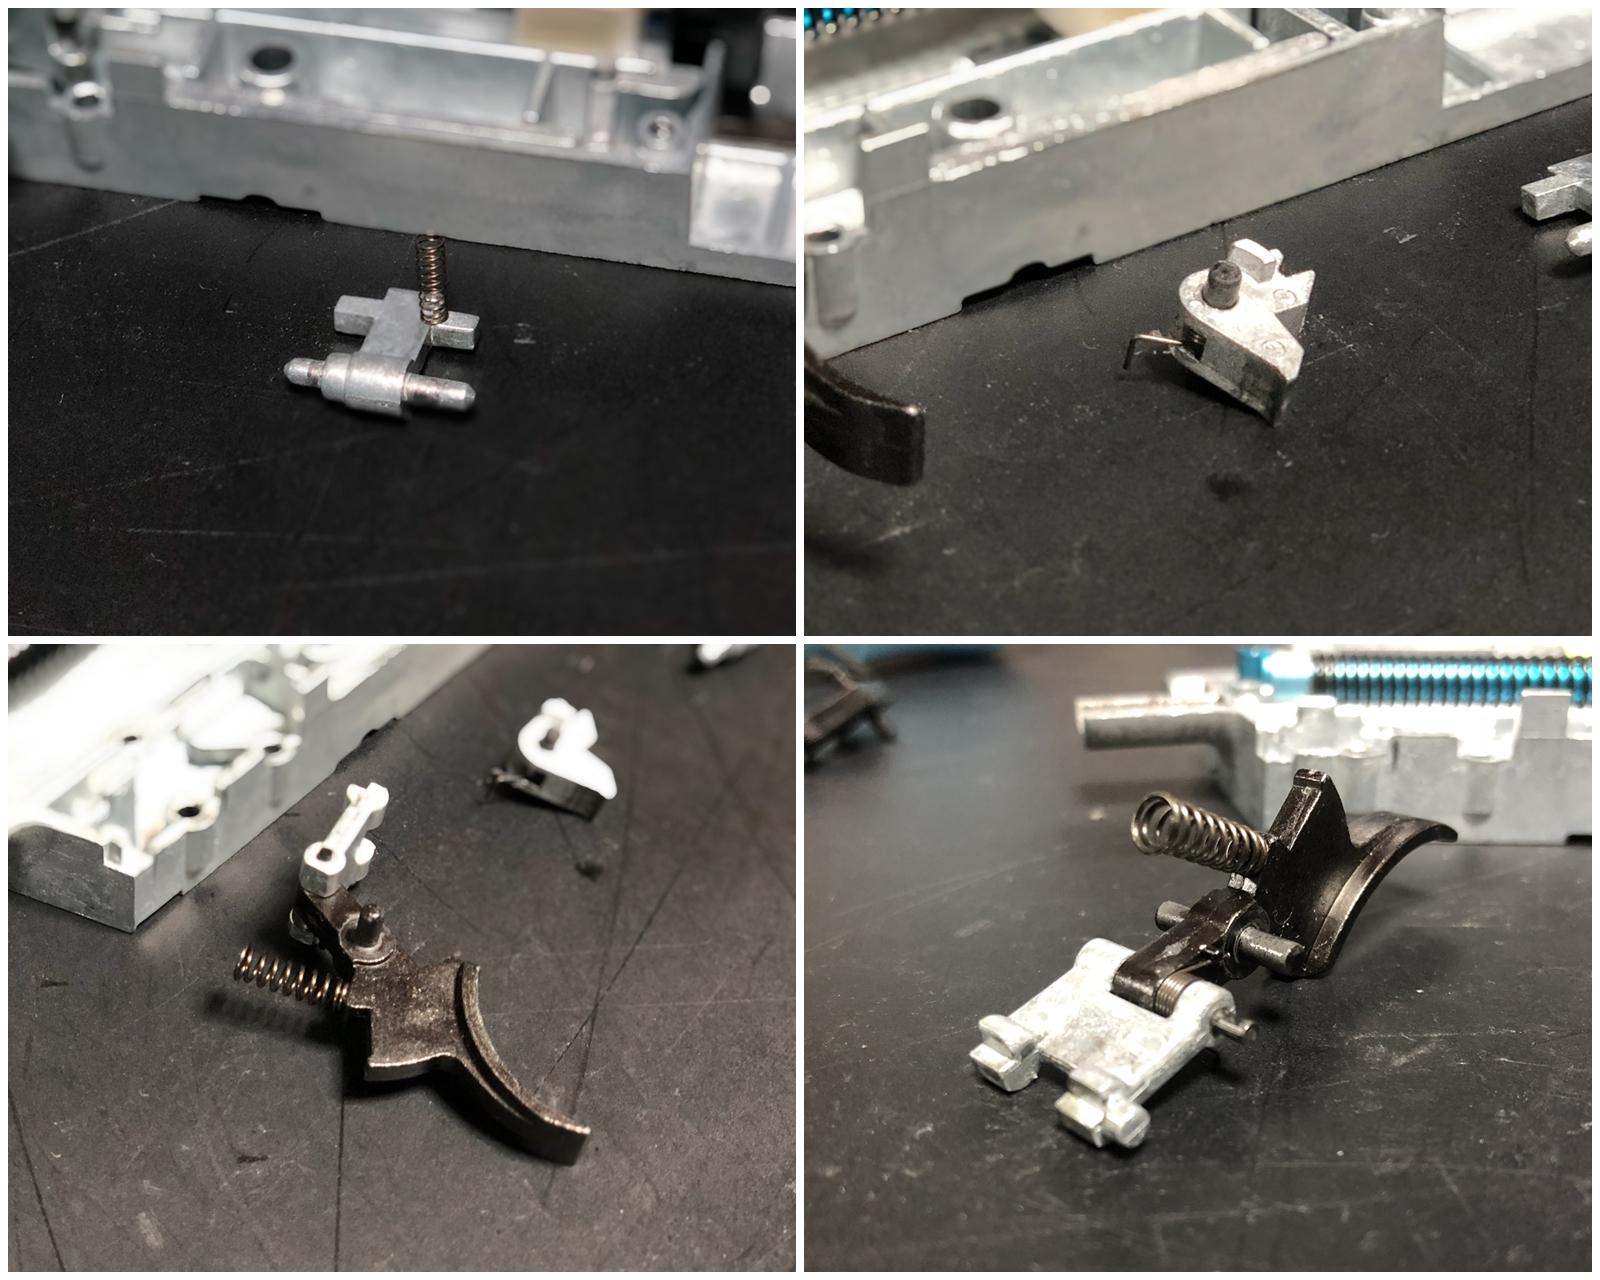 12 MALZEN 『CA870チャージャー』 を 『CA870ソードオフ』 へ改造計画!! トリガー&トリガーガード交換編!!